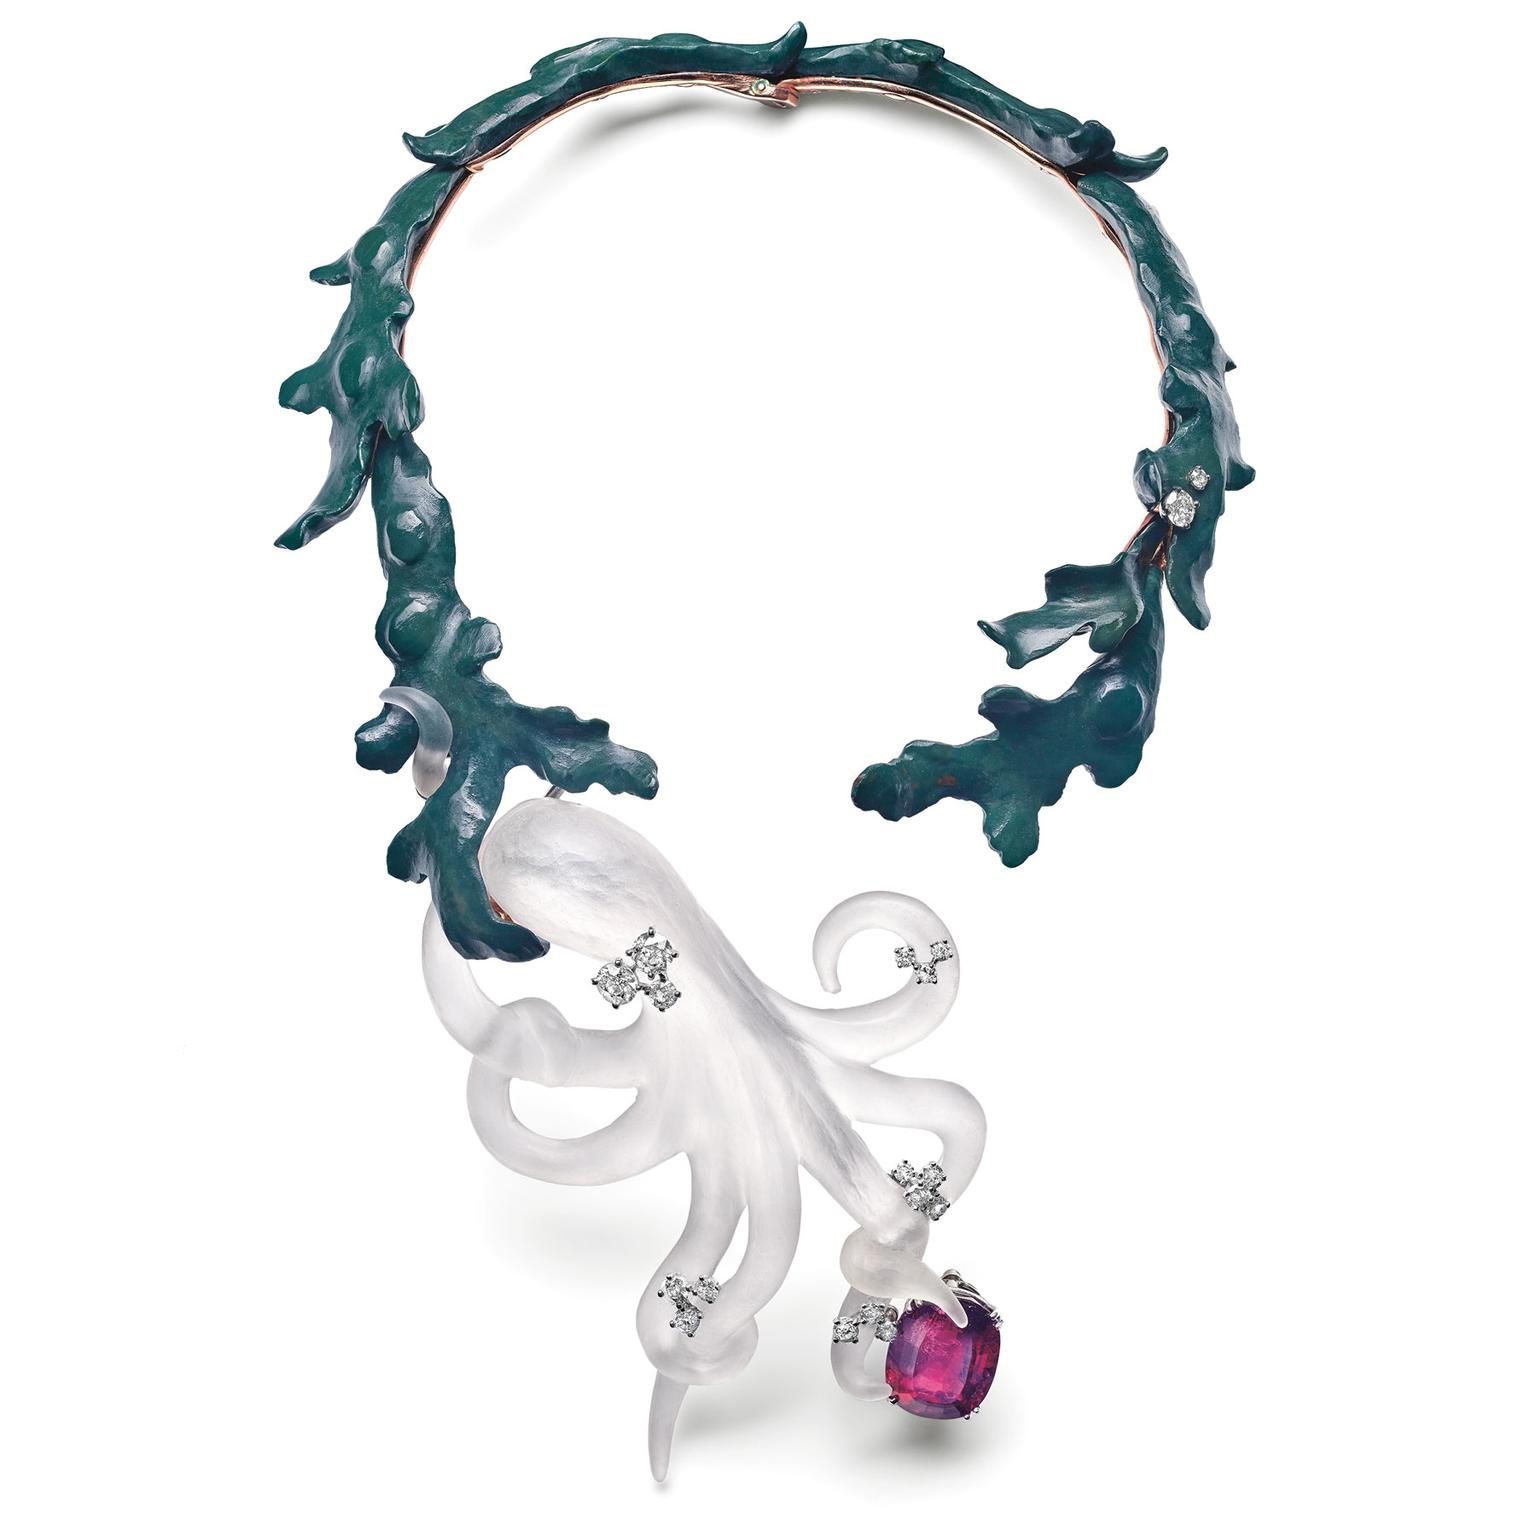 3-octopus-necklace-chaumet-1970.jpg__1536x0_q75_crop-scale_subsampling-2_upscale-false